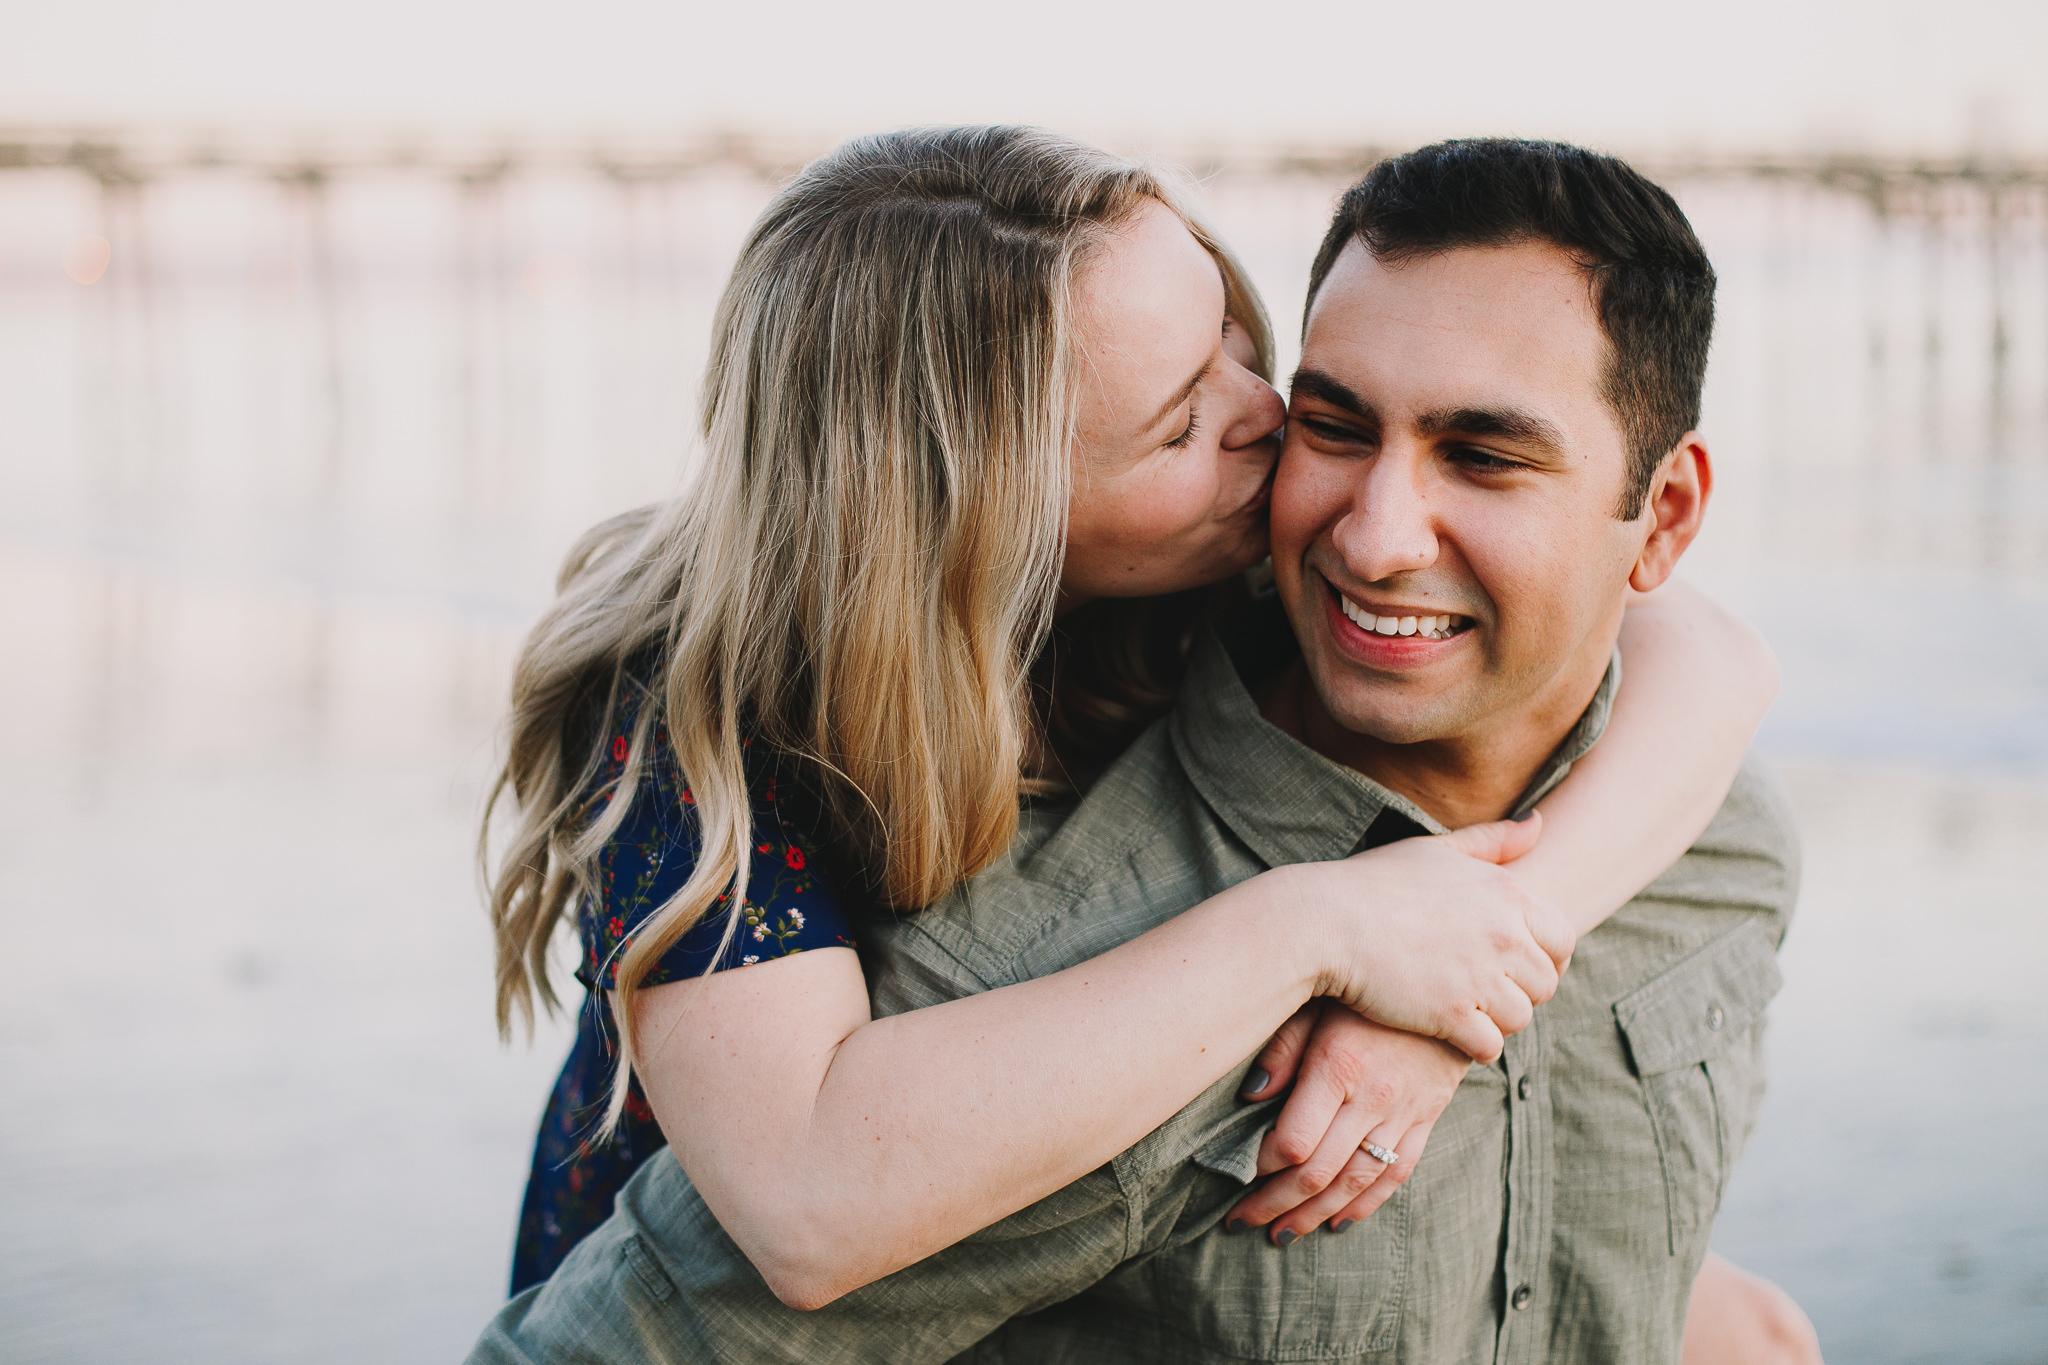 Archer Inspired Photography Capitola Beach Santa Cruz Wedding Engagement Lifestyle Session Photographer-147.jpg